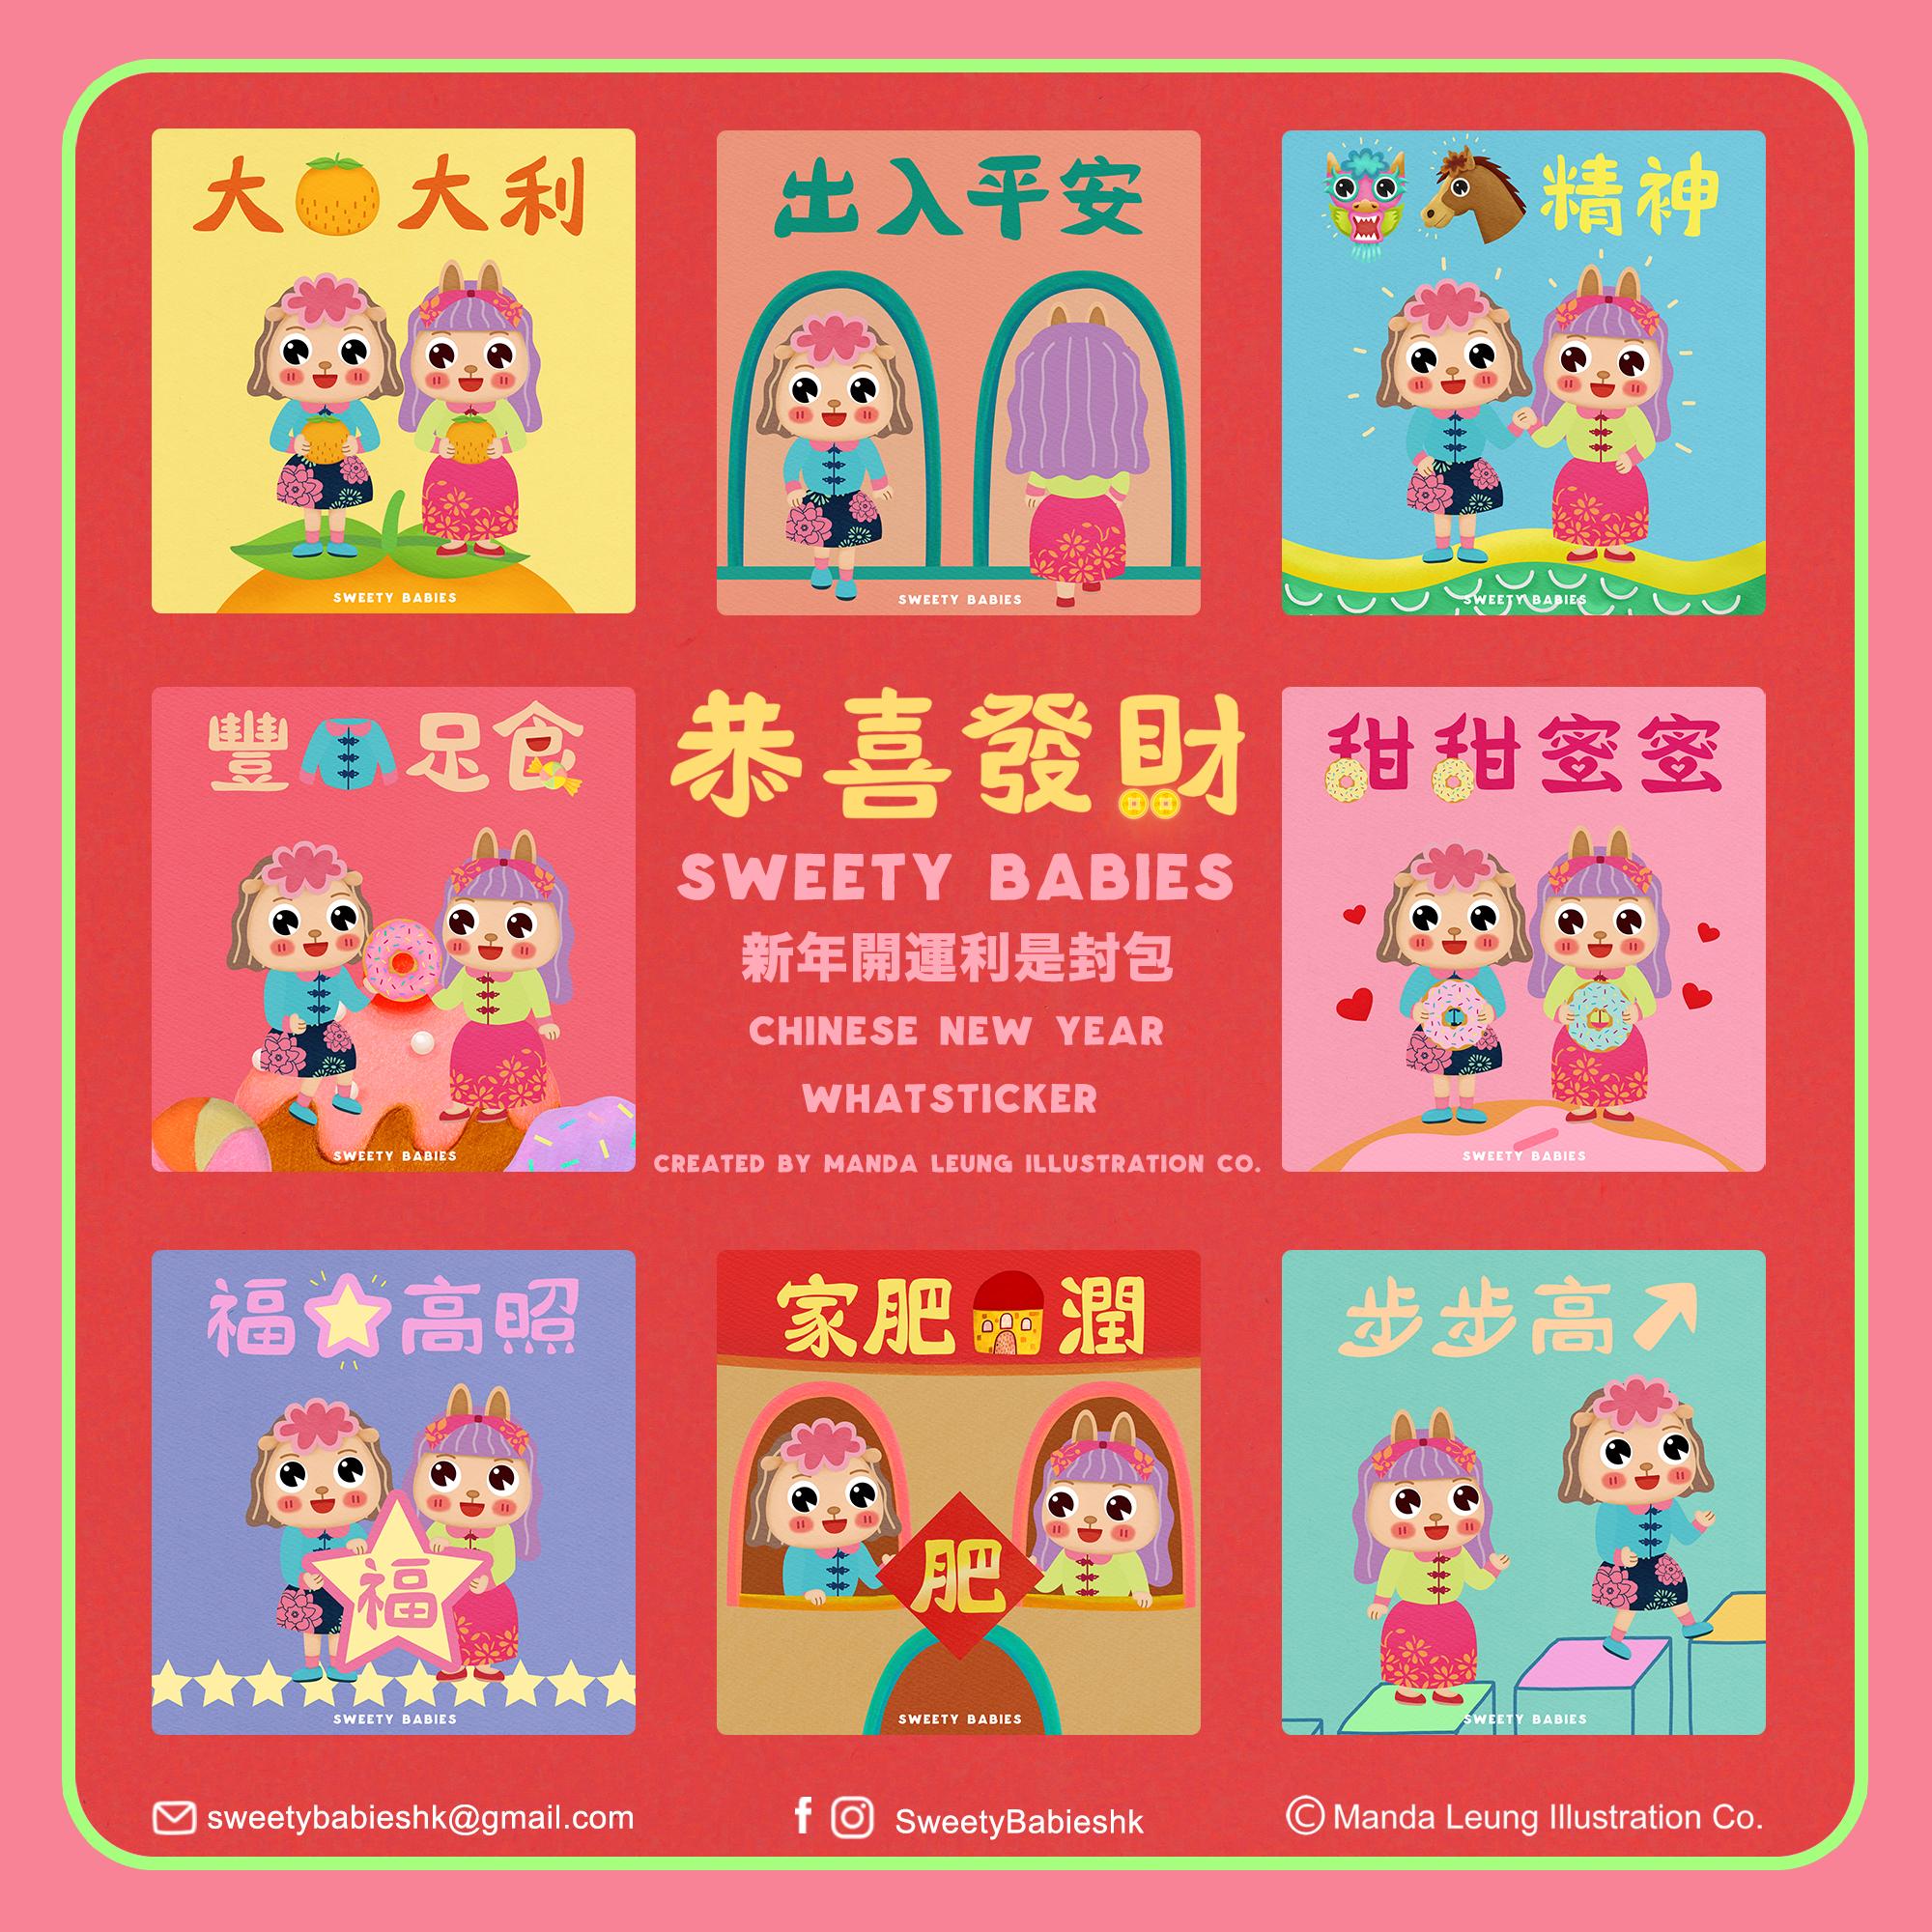 Sweety Babies CNY 2020 Whatsticker